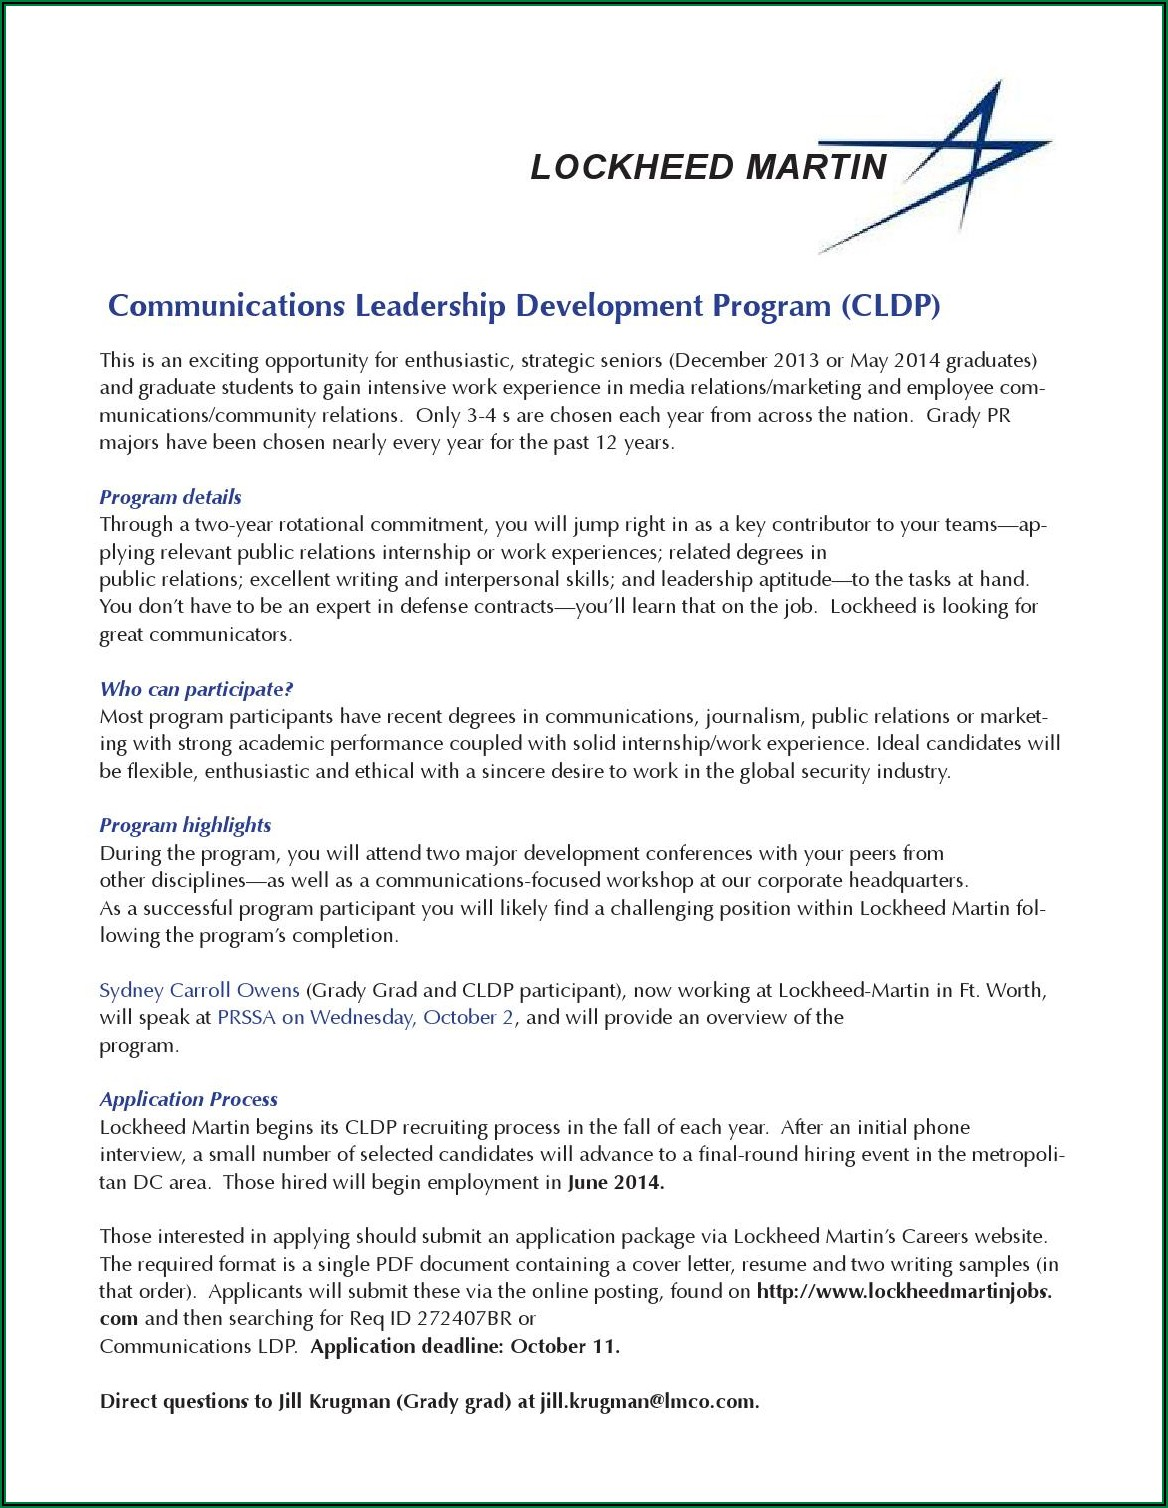 Lockheed Martin Intern Hiring Process